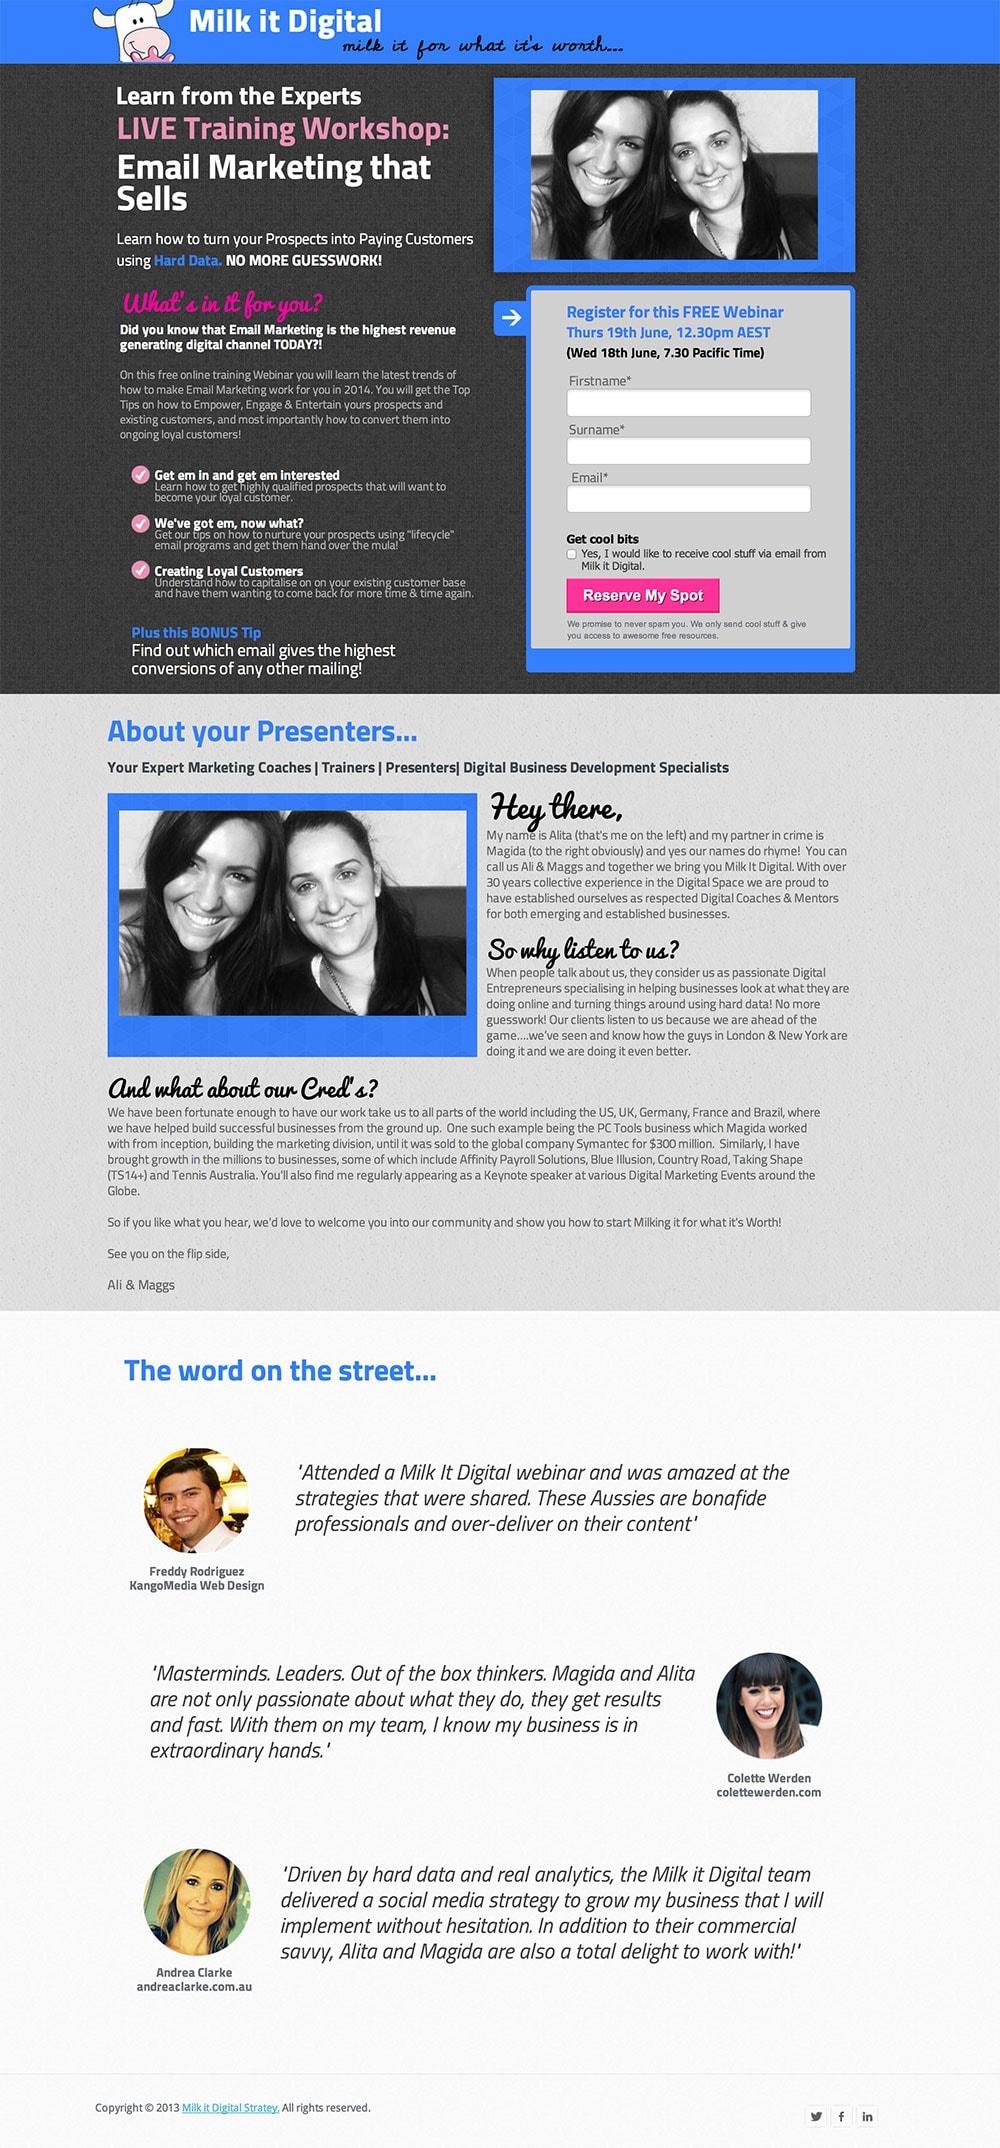 milkdigitalstrategy-email-that-sells-webinar-560